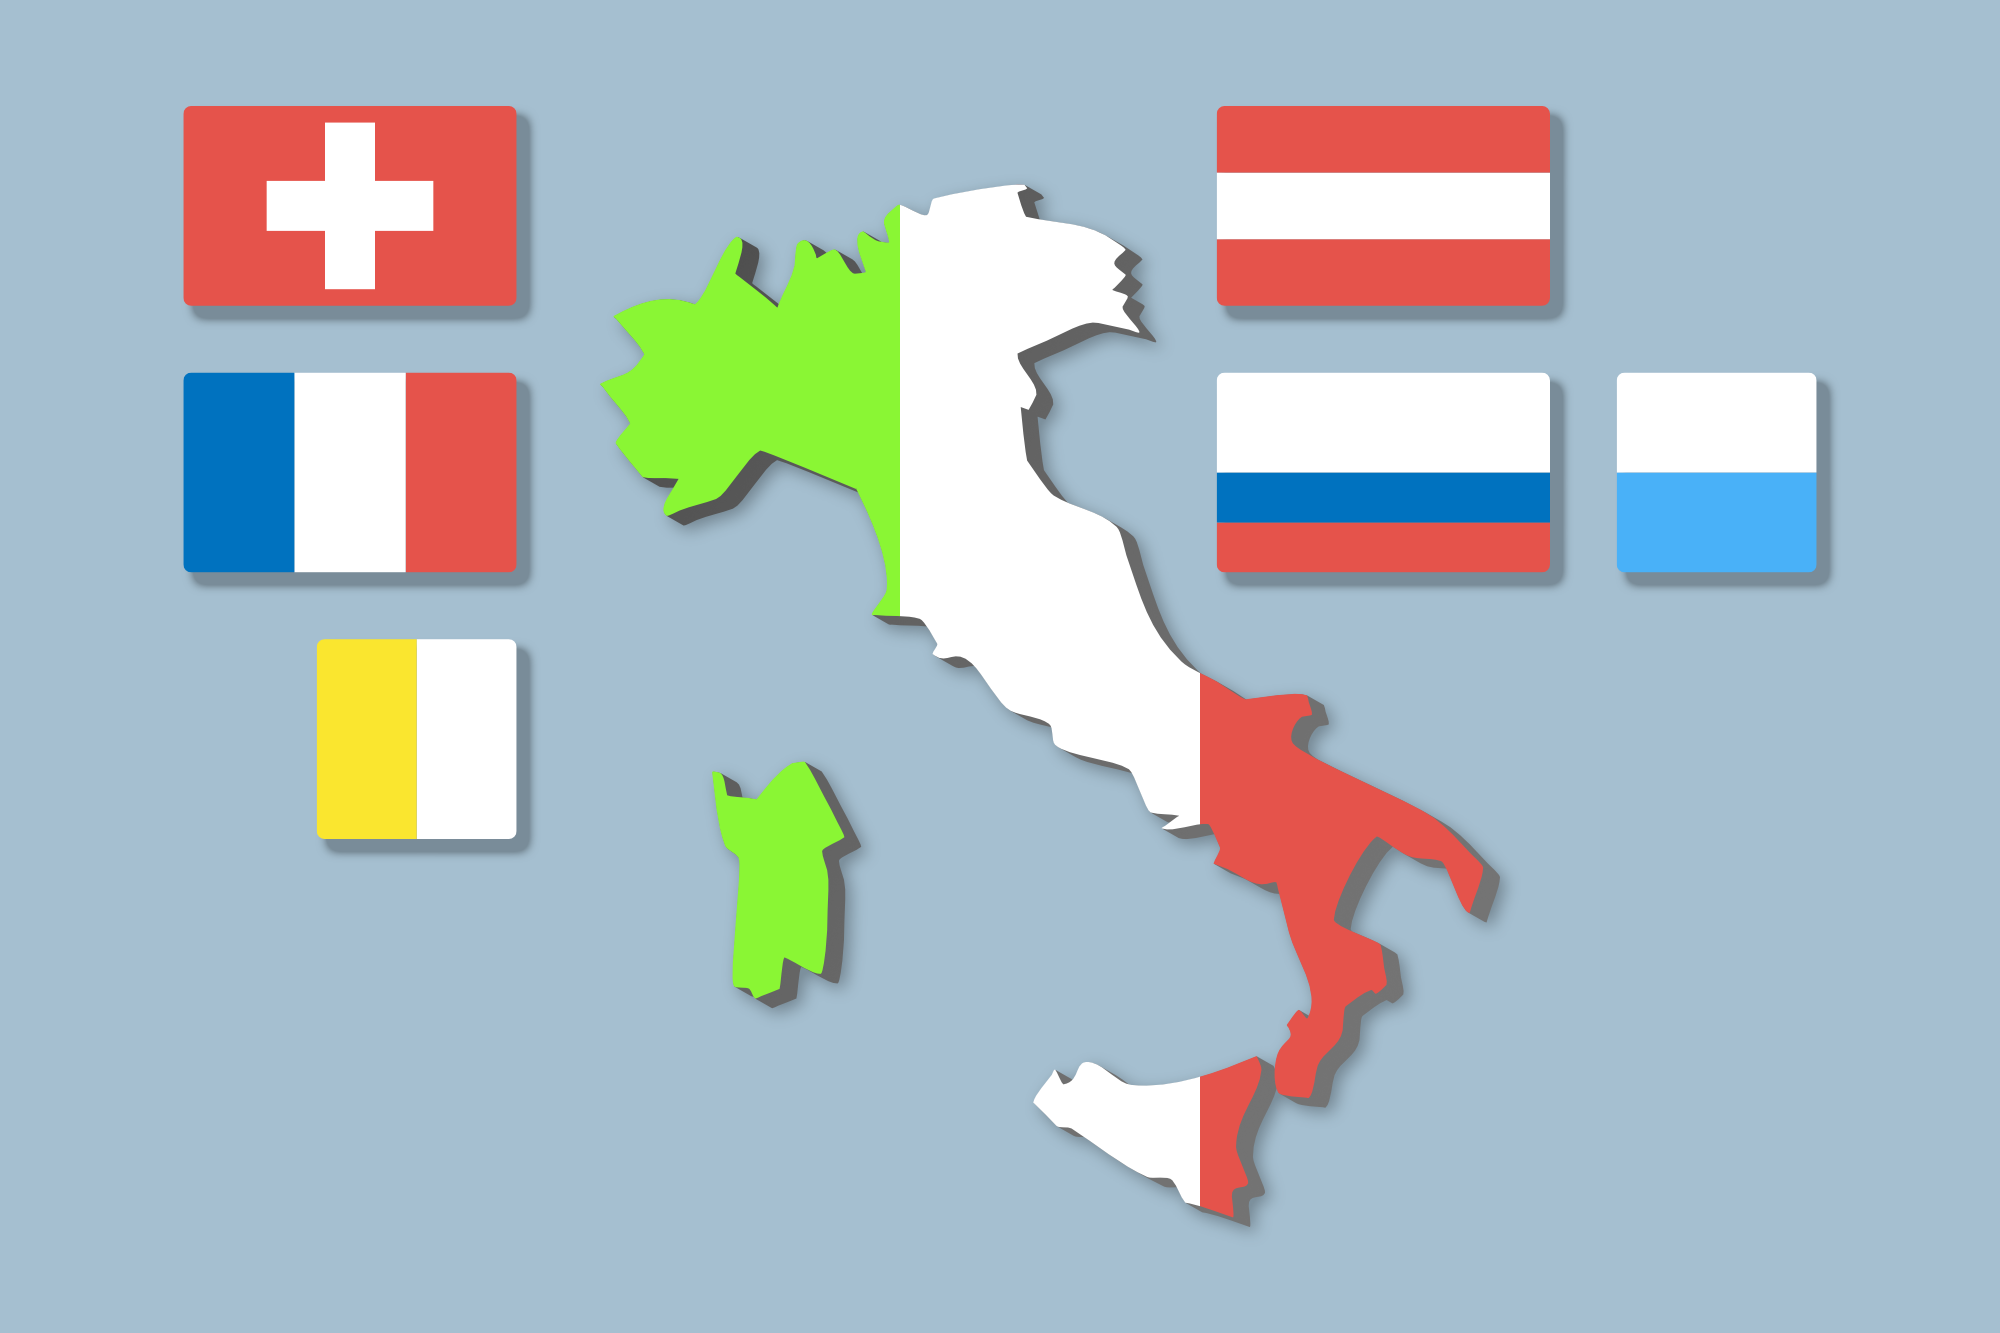 nachbarlaender-italien